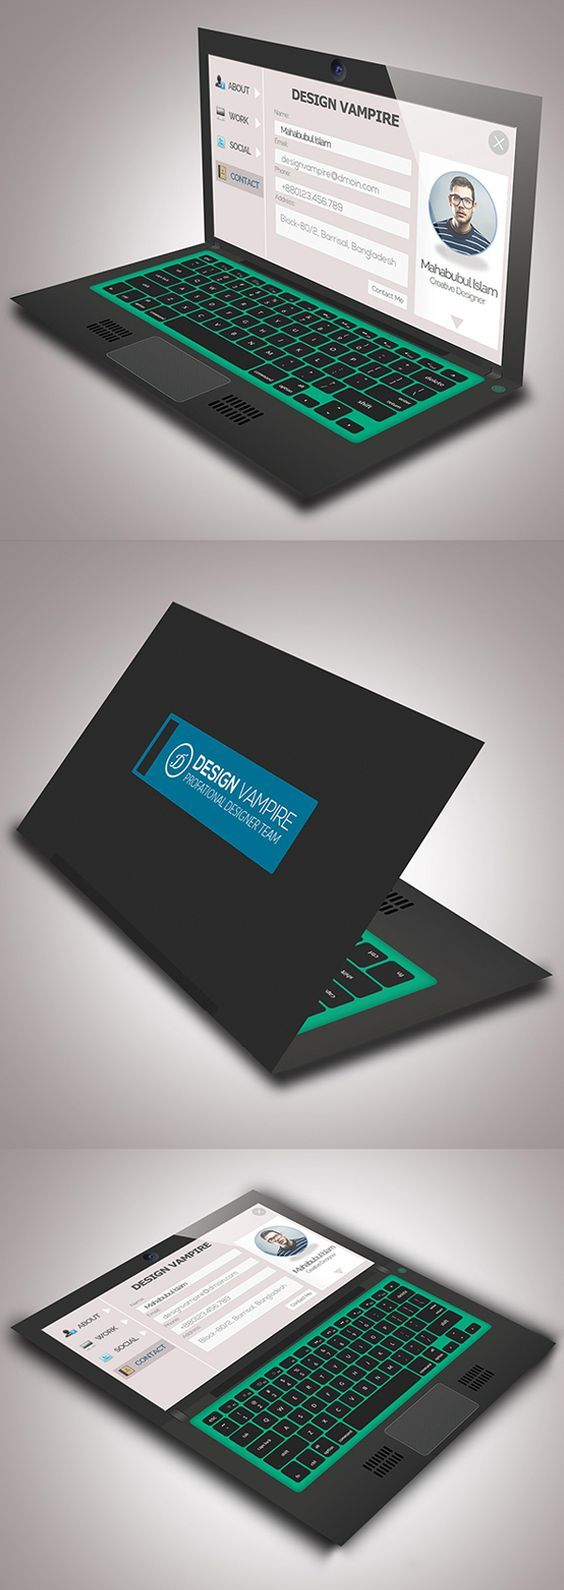 Laptop Business Card #businesscards #psdtemplates #visitingcard #corporatedesign: